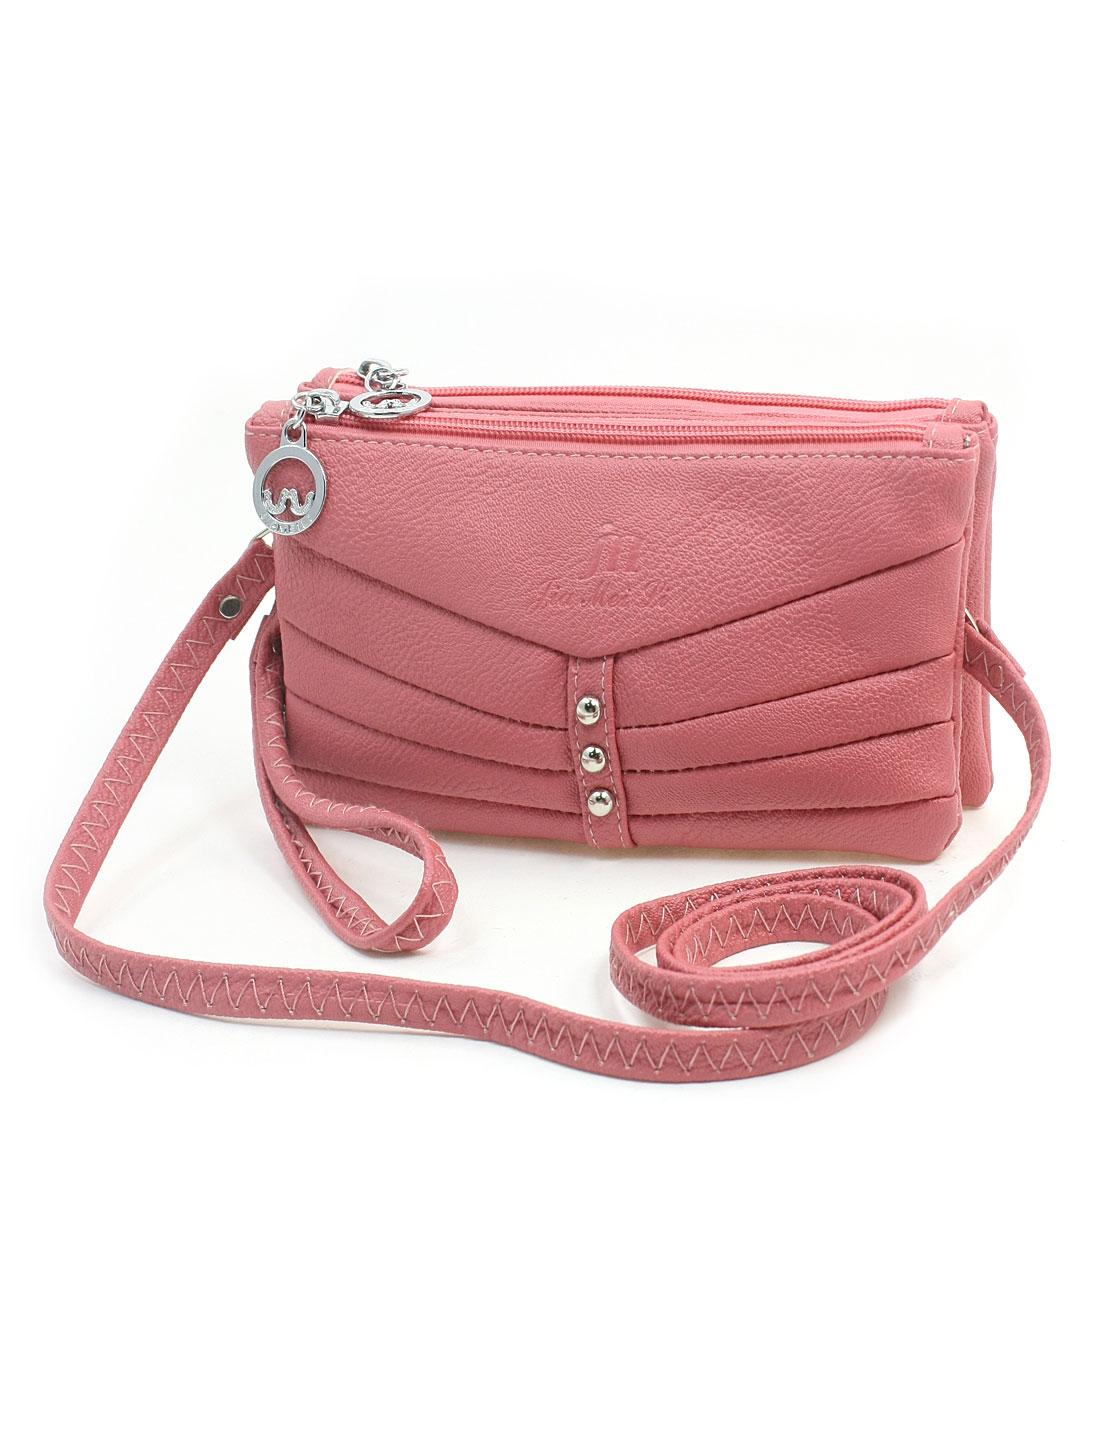 Women Zipper Closure 3 Compartments Litchi Pattern Pink Faux Leather Shoulder Bag Purse Wallet w Hand Strap